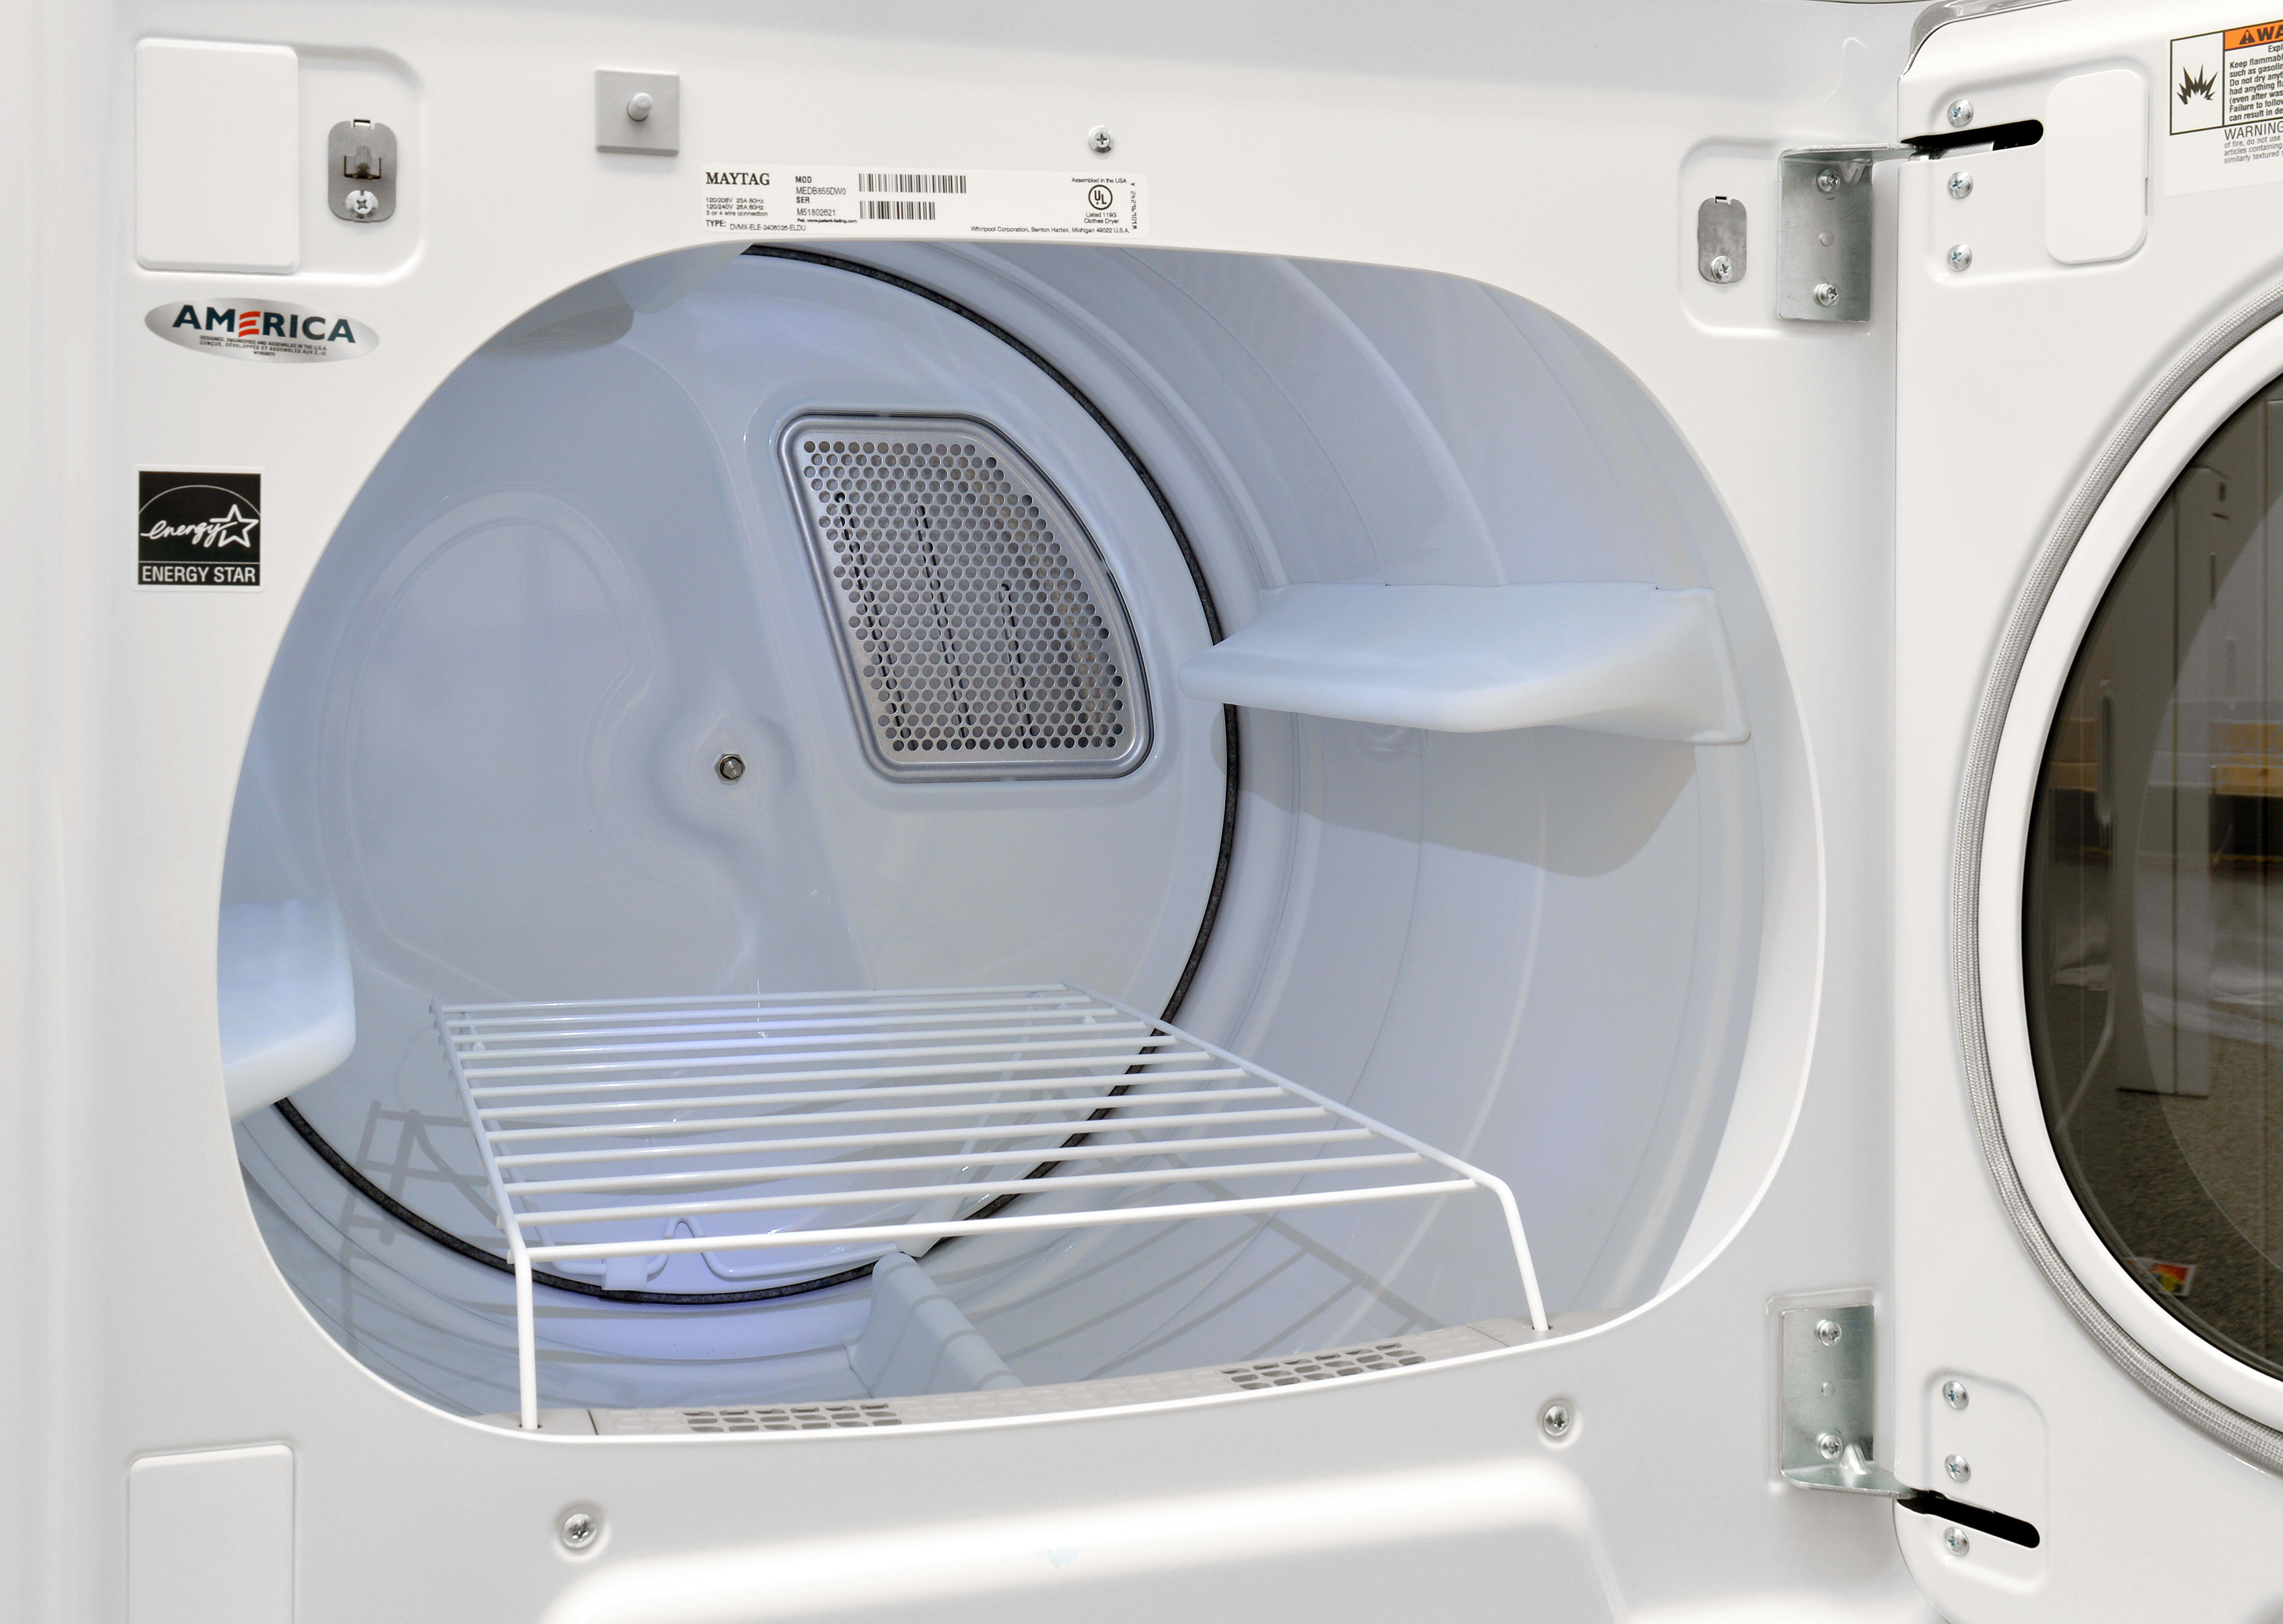 Maytag Bravos Mgdb855dw Dryer Review Reviewed Com Laundry